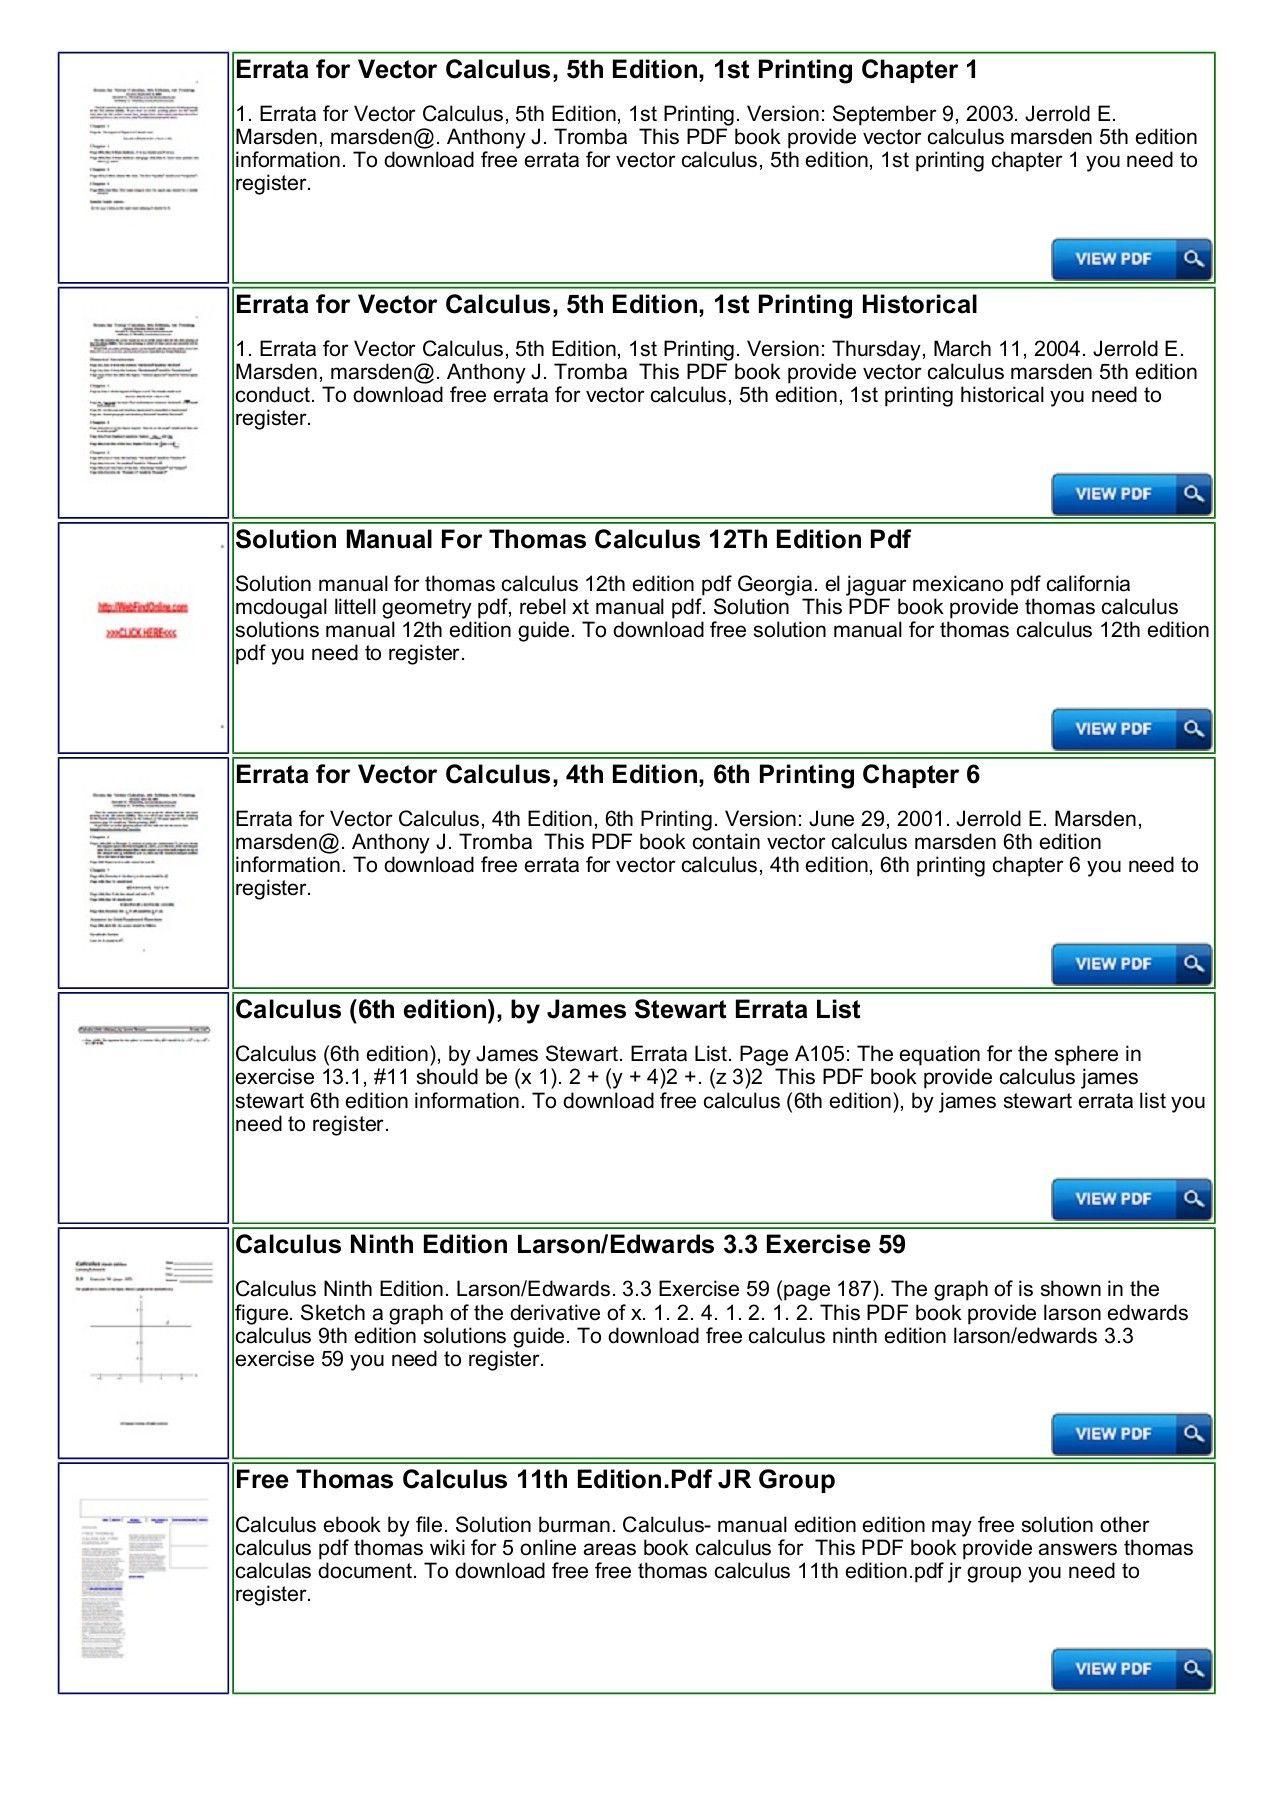 Ncci Com Worksheets